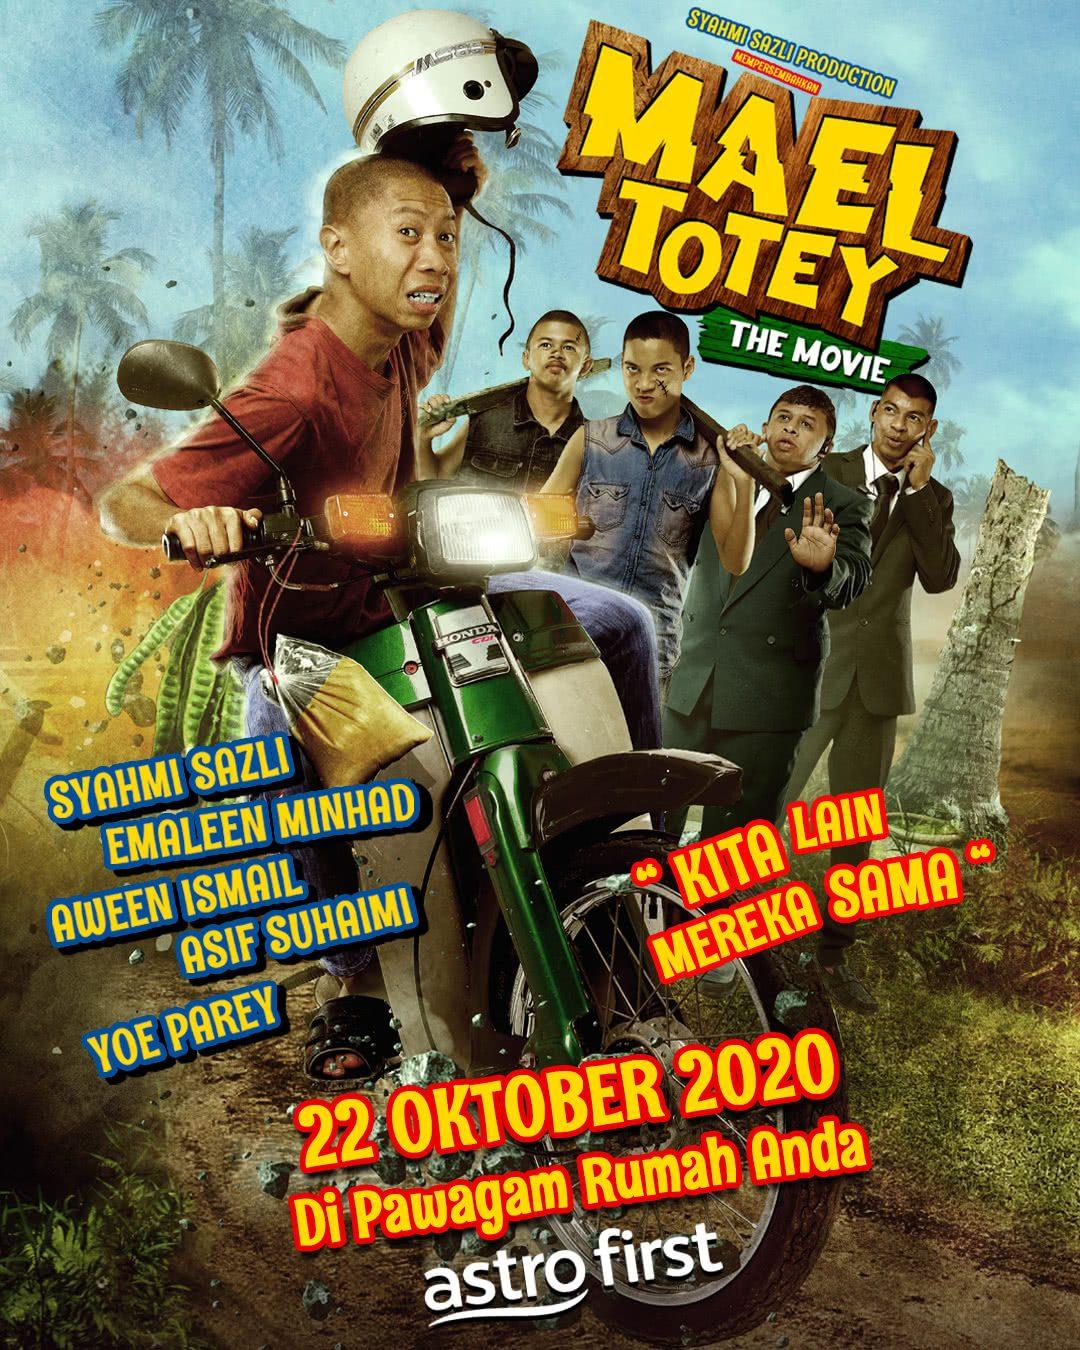 Mael Totey The Movie Syahmi Sazli